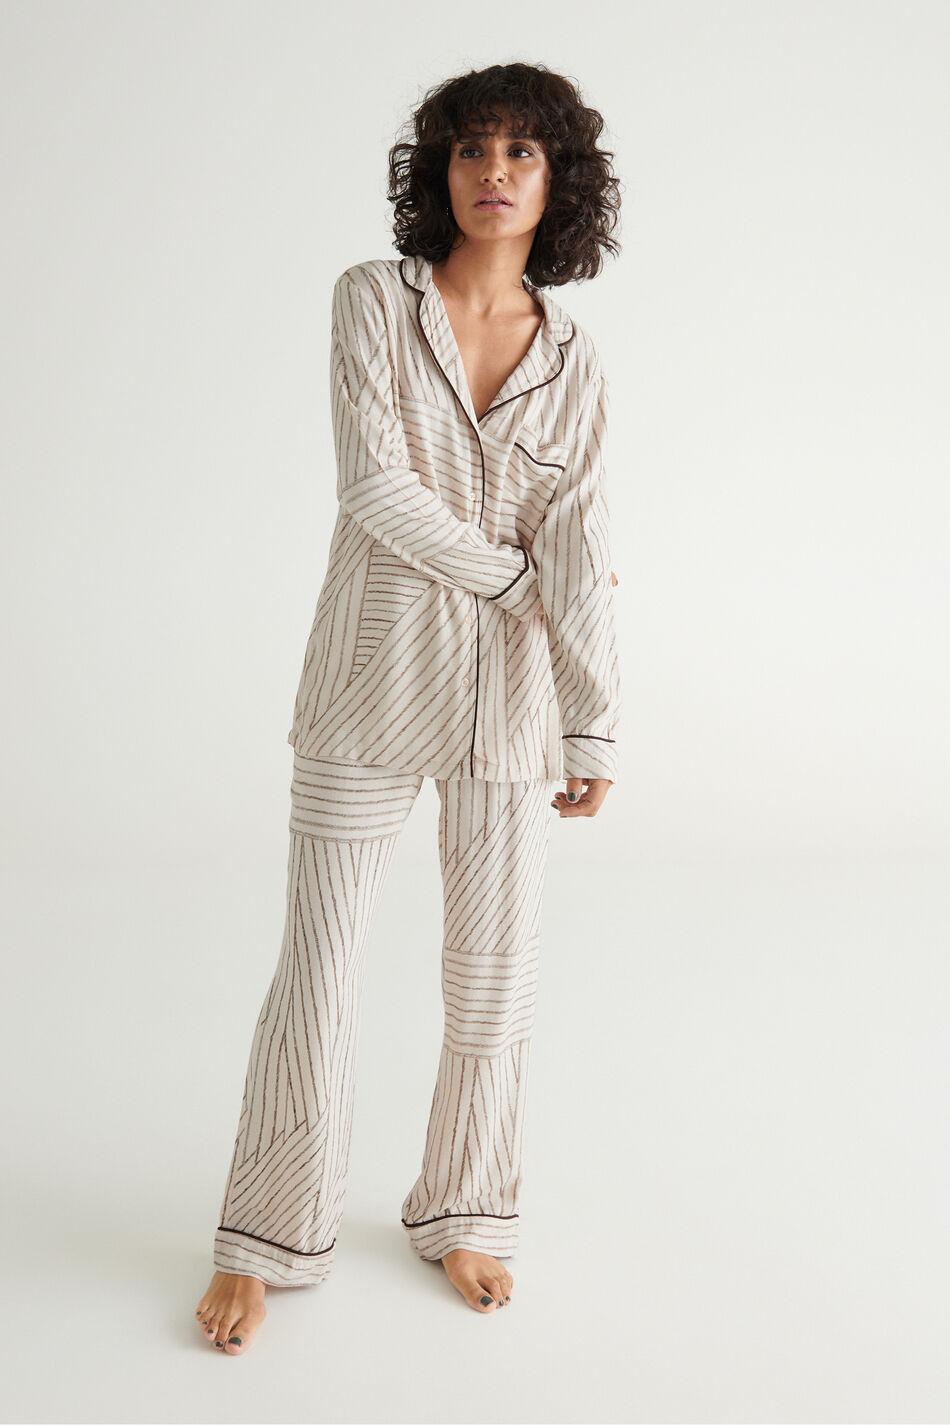 Gina Tricot Kylie pyjamas shirt